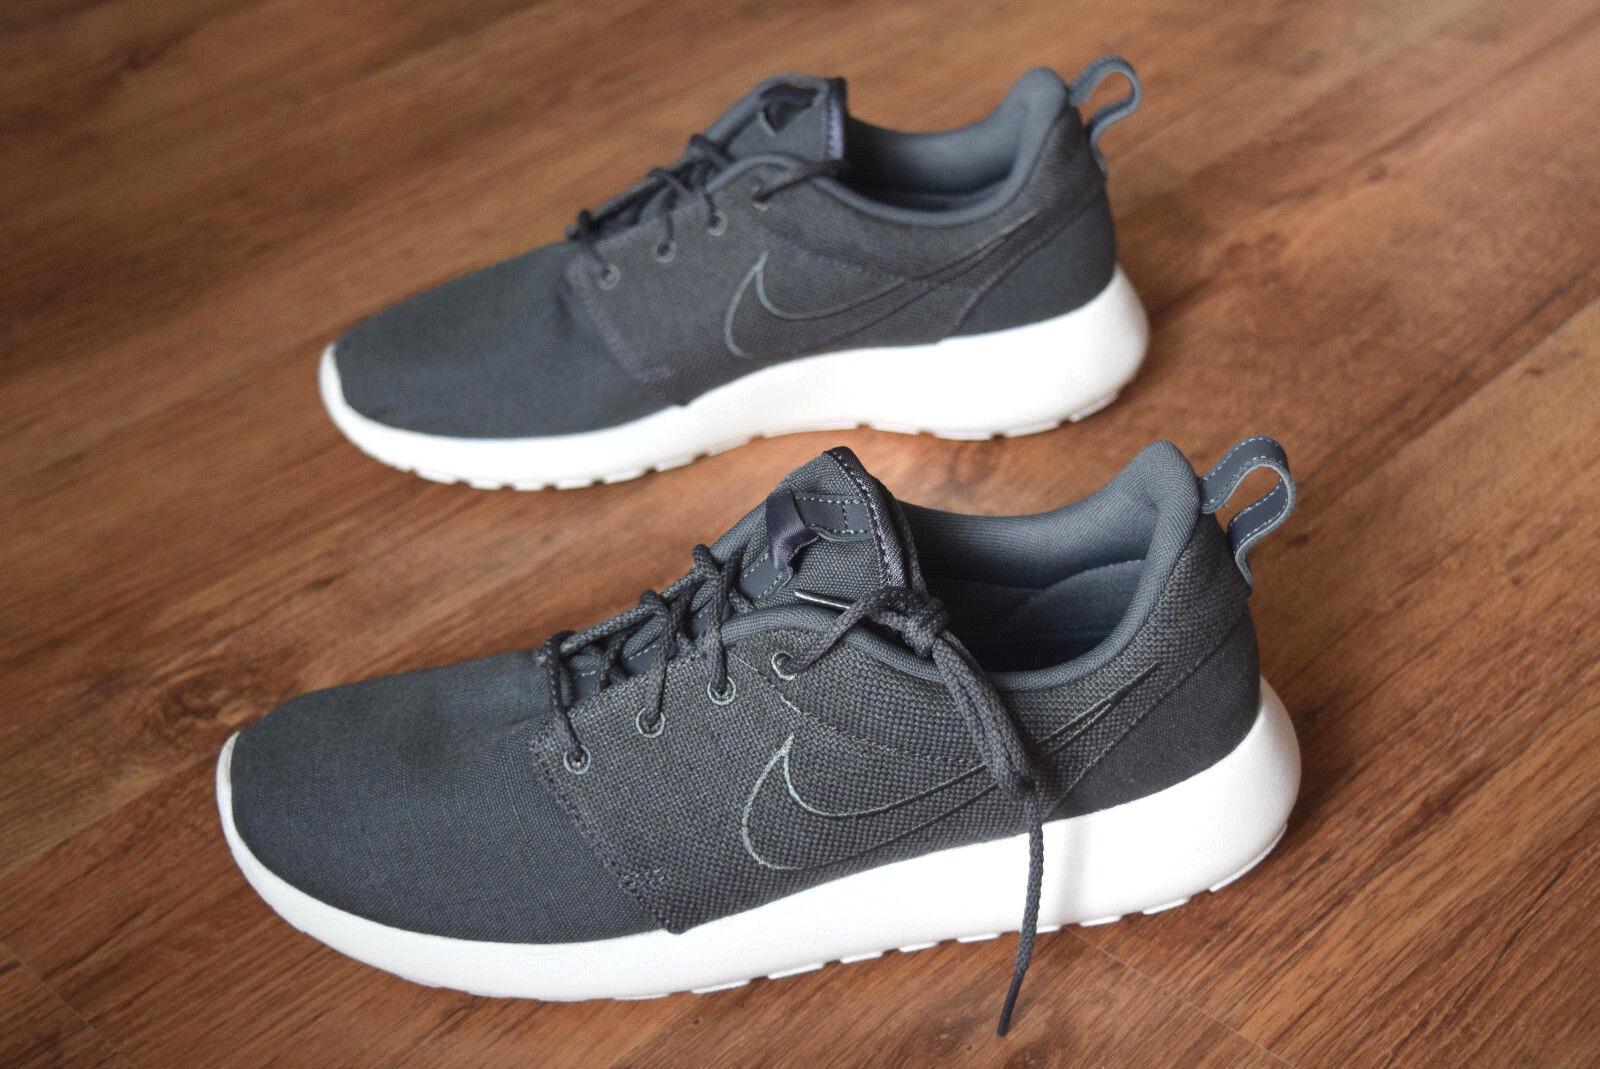 Nike Roshe one Premium 41 42 43 44 45 46 47 Canvas free aIr run tAvaS 525234 012    | Erschwinglich